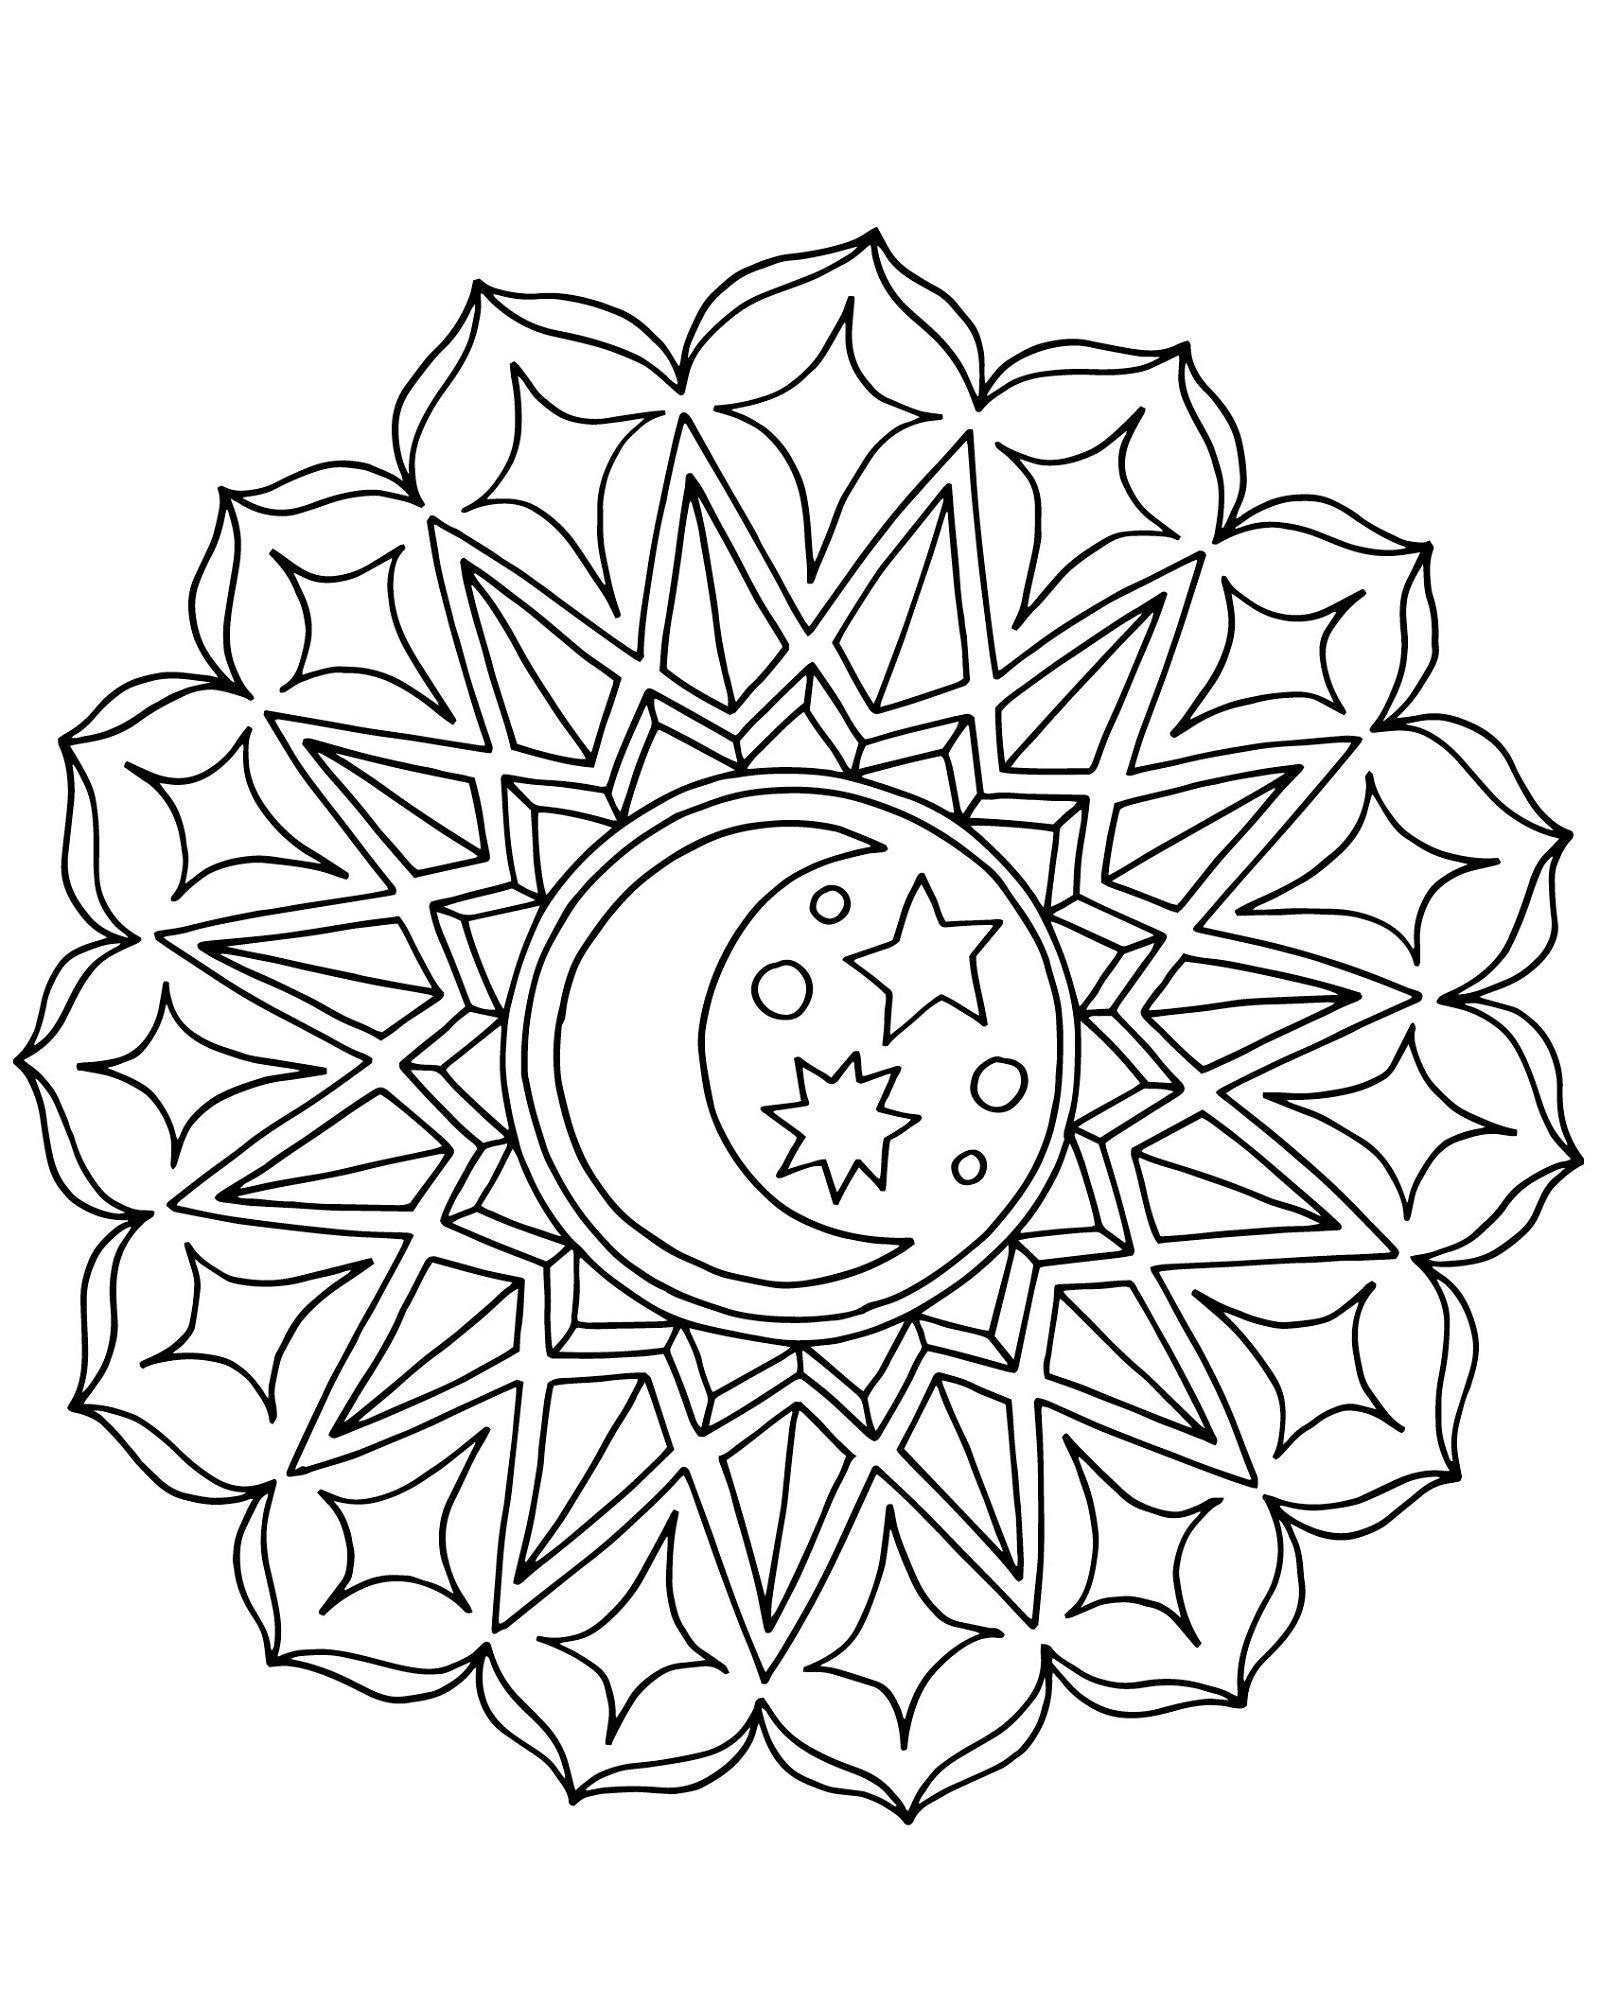 Moon And Stars Coloring Pages Art Mandala Malvorlagen Mandala Ausmalen Bilder Zum Ausmalen